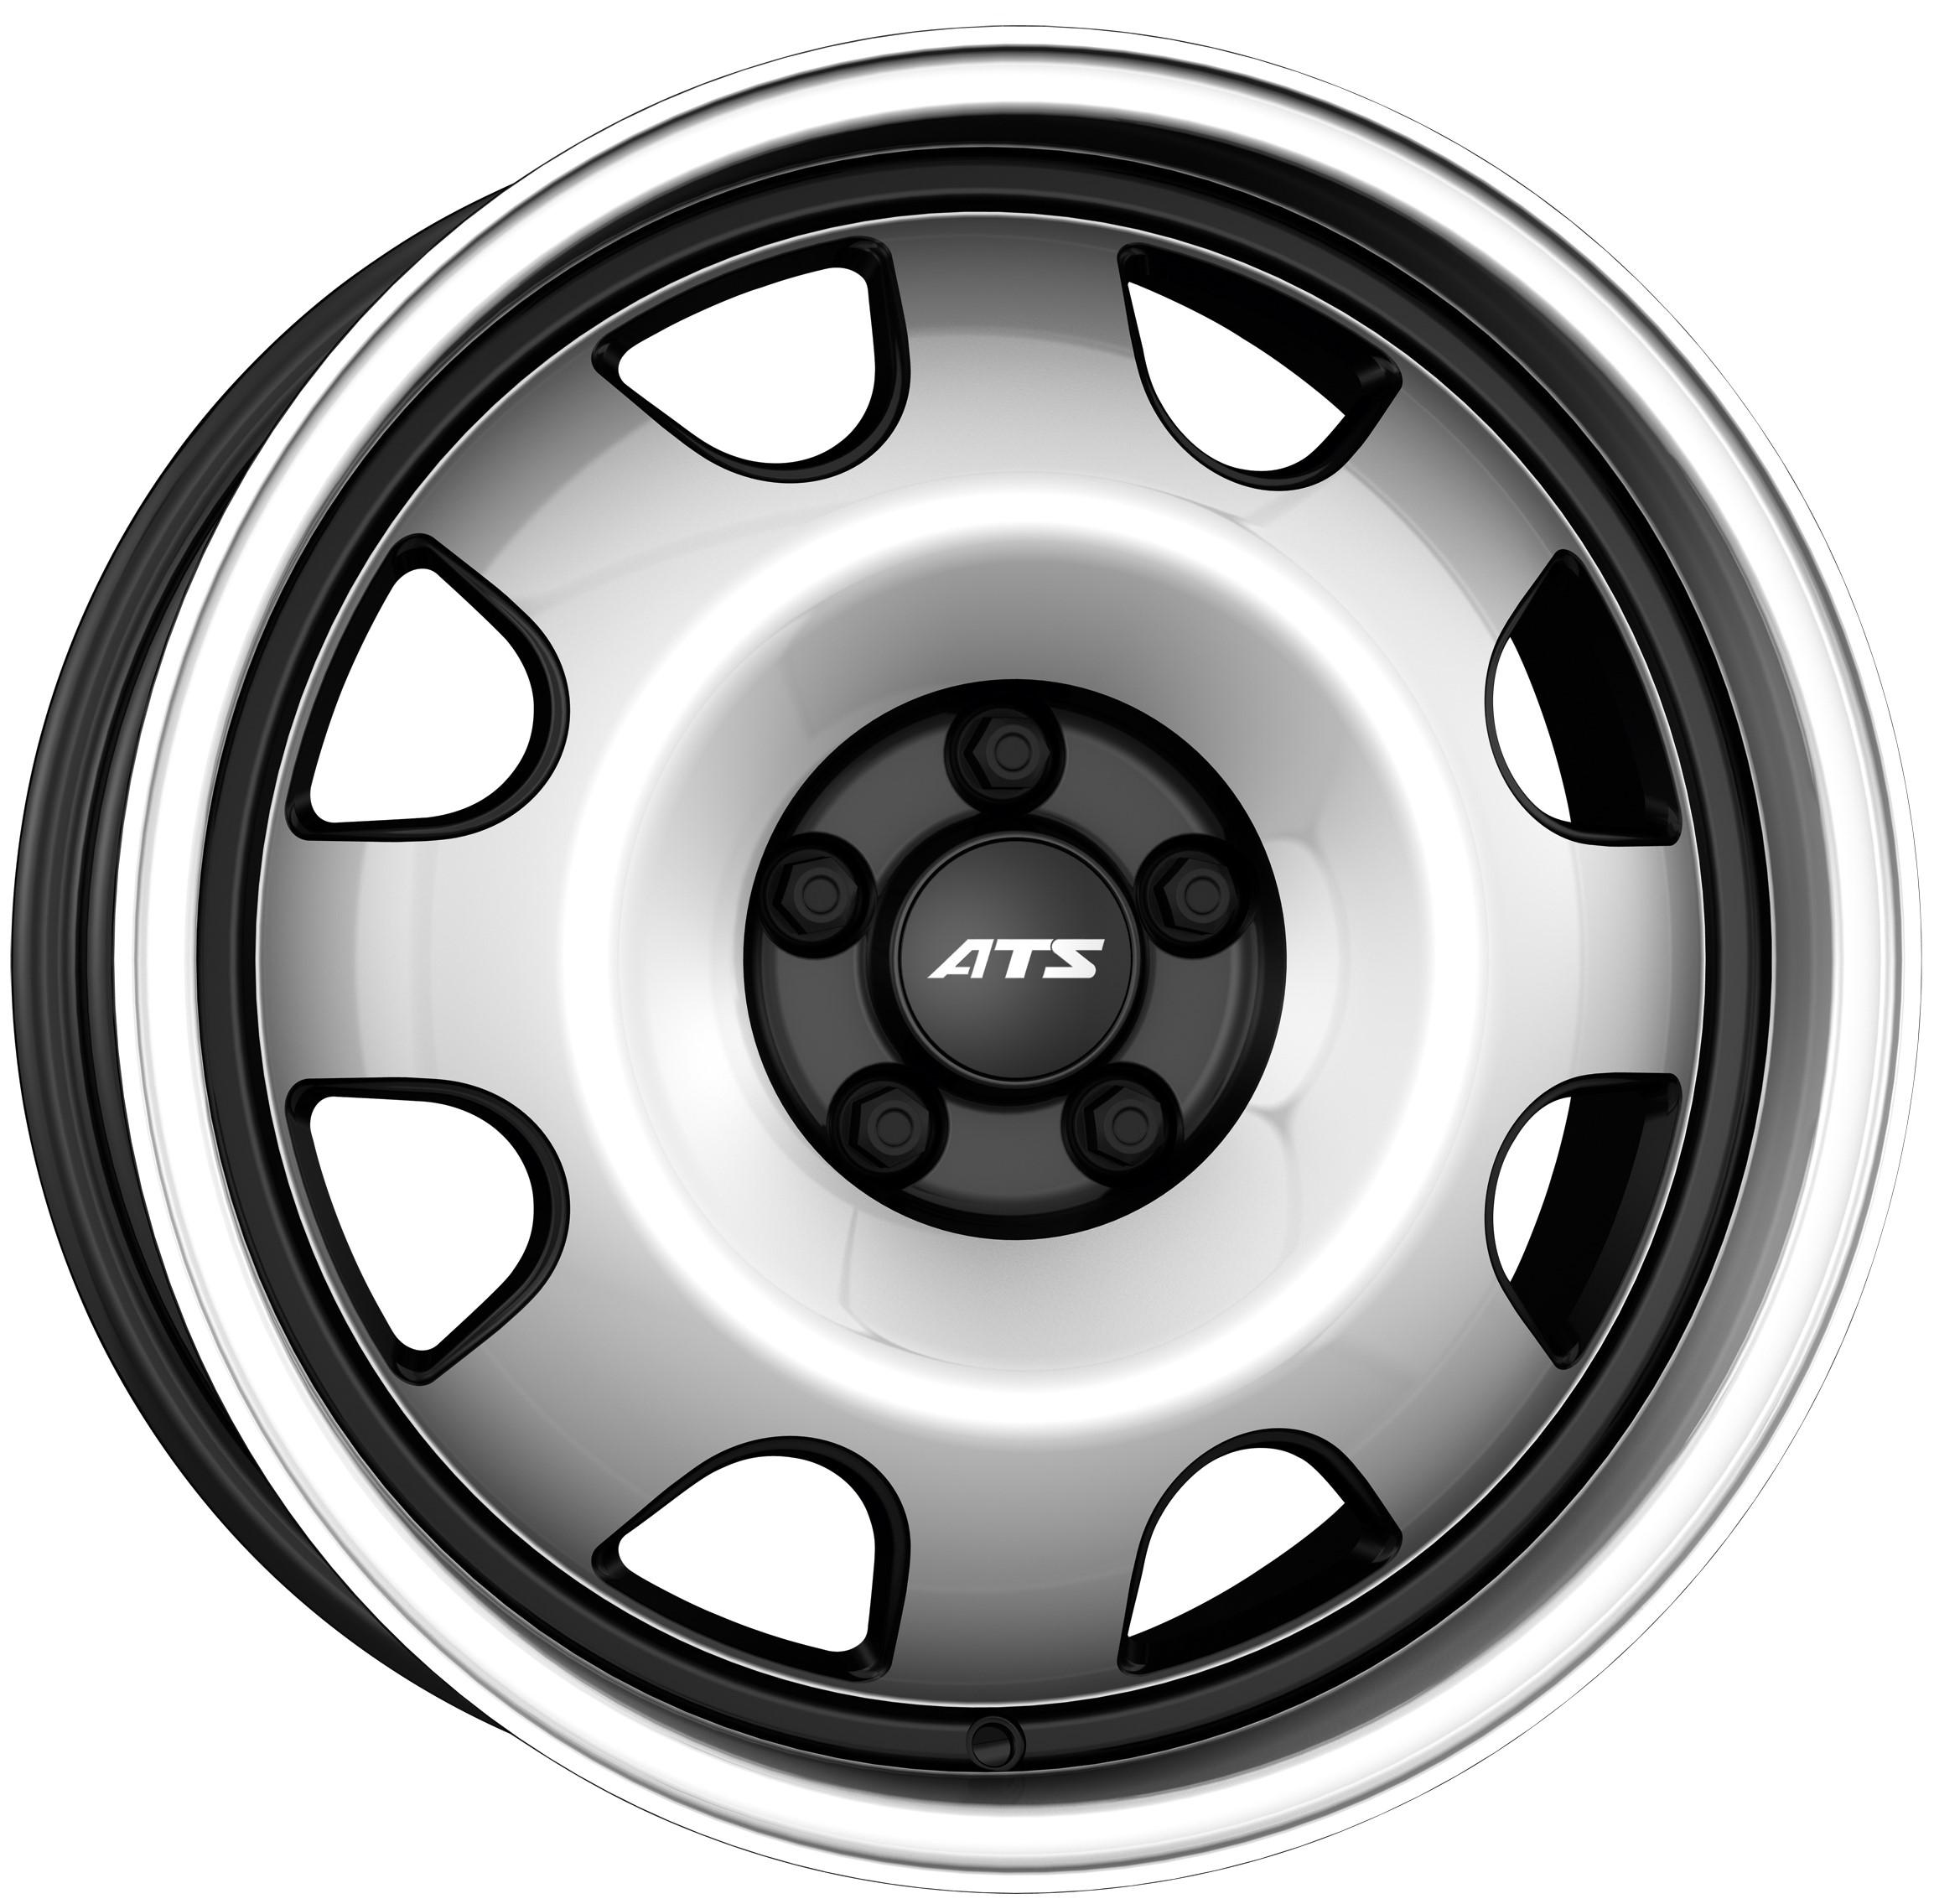 ATS - Cup (Diamond Black / Polished)